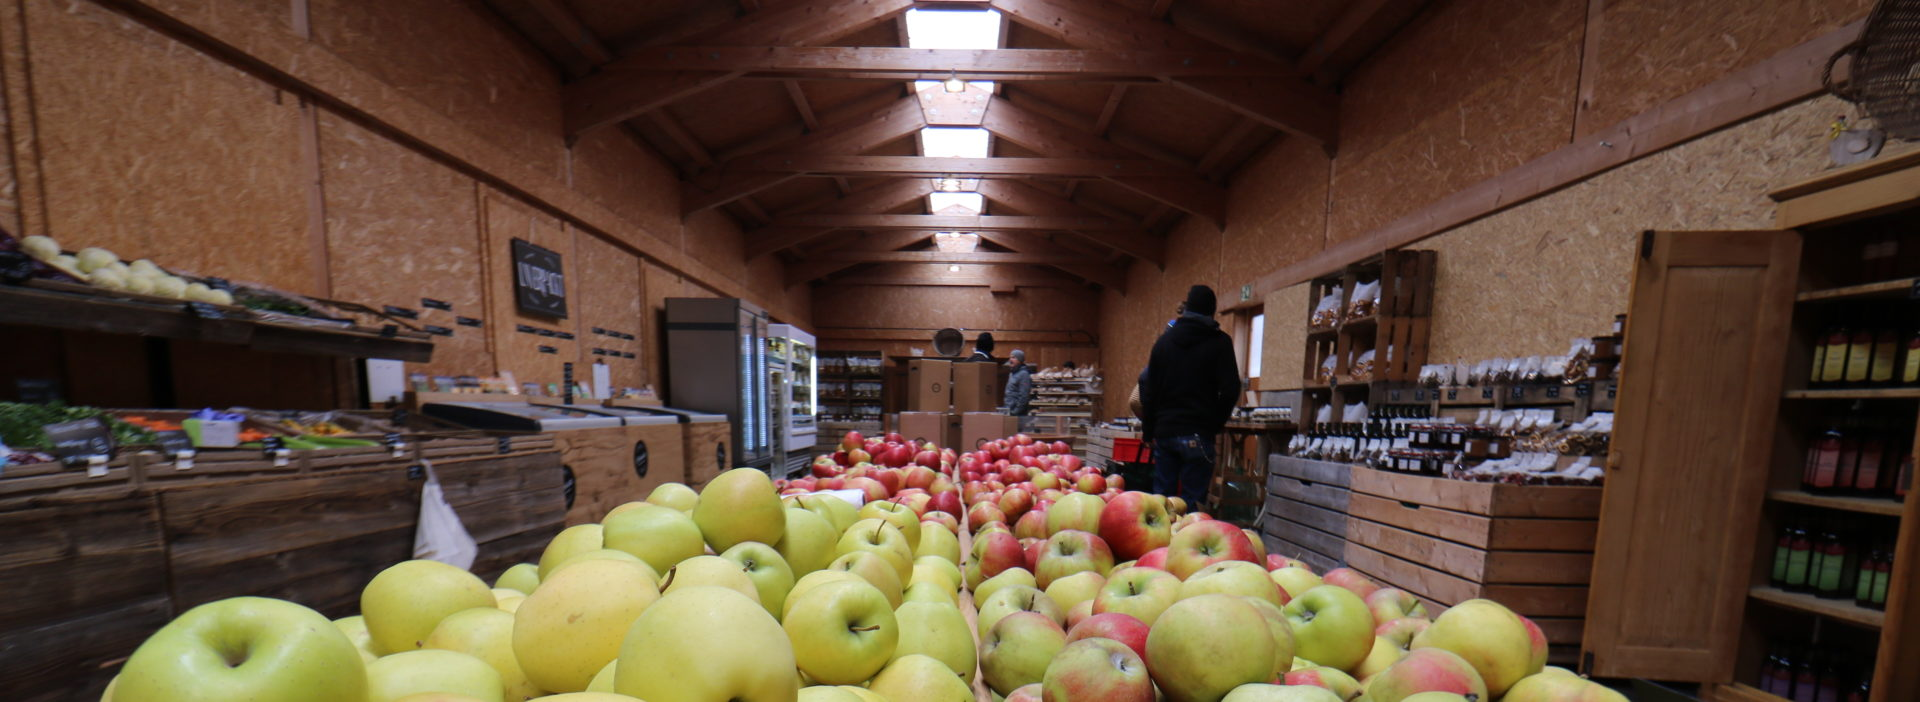 PopUp Römerhof Äpfel